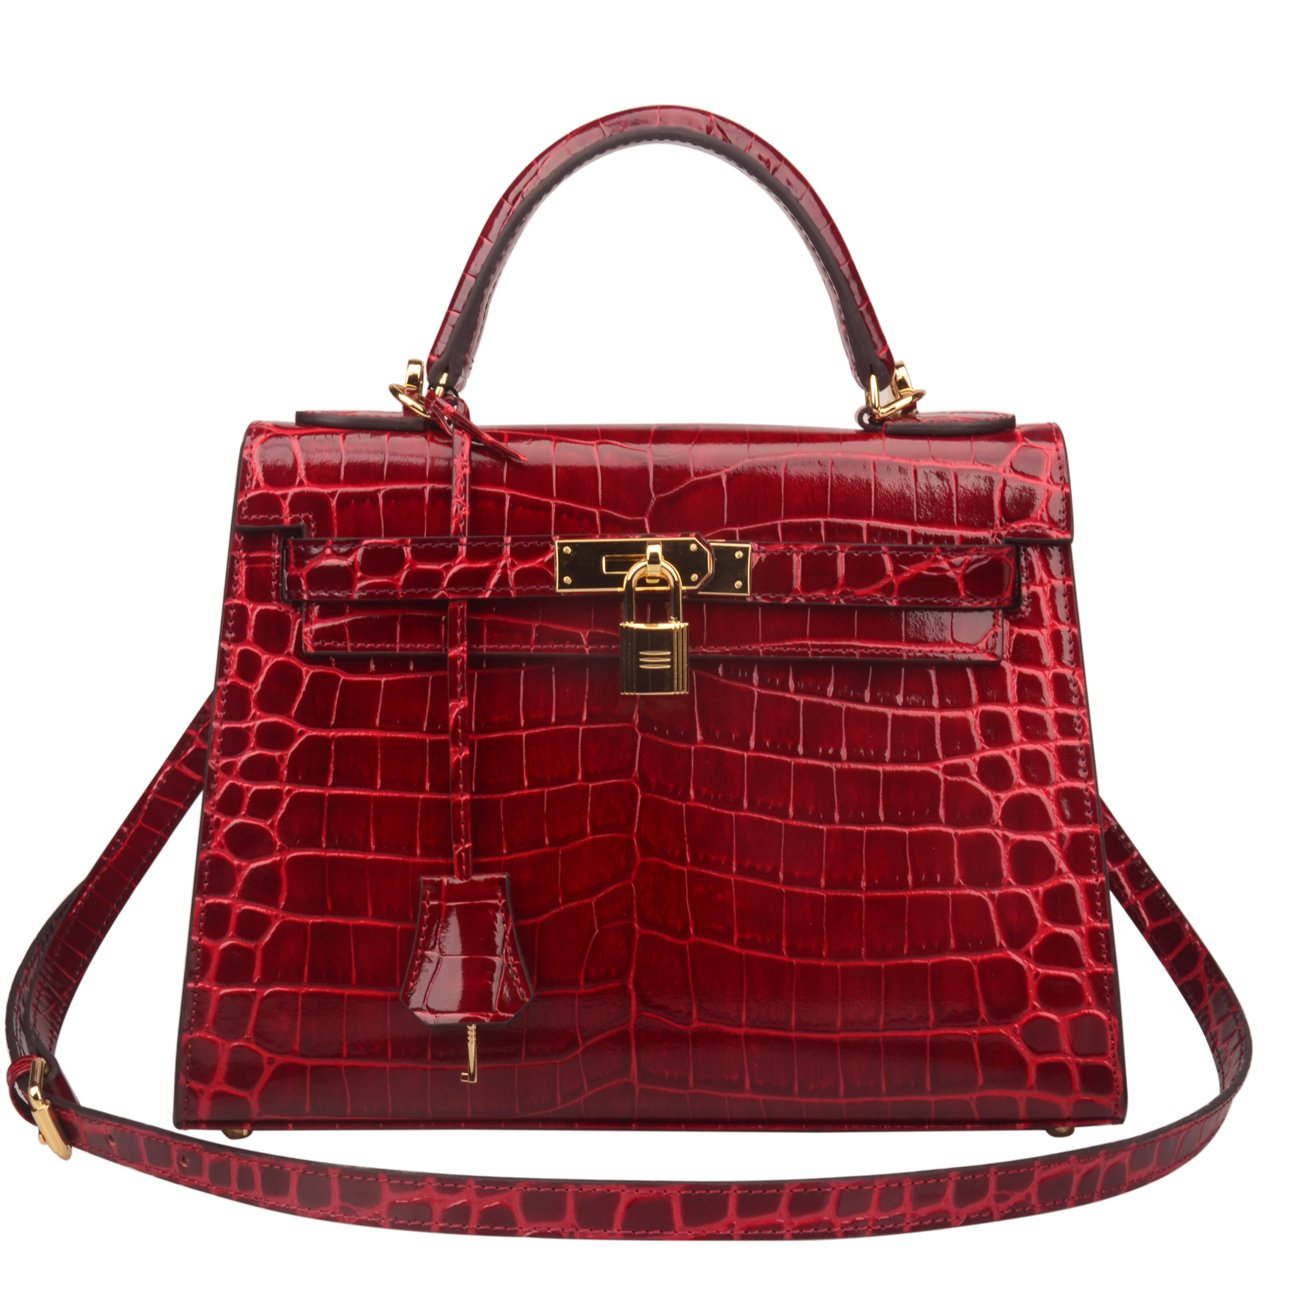 Ainifeel Women's Padlock Crocodile Embossed Patent Leather Shoulder Handbags (28cm, Claret red) by Ainifeel